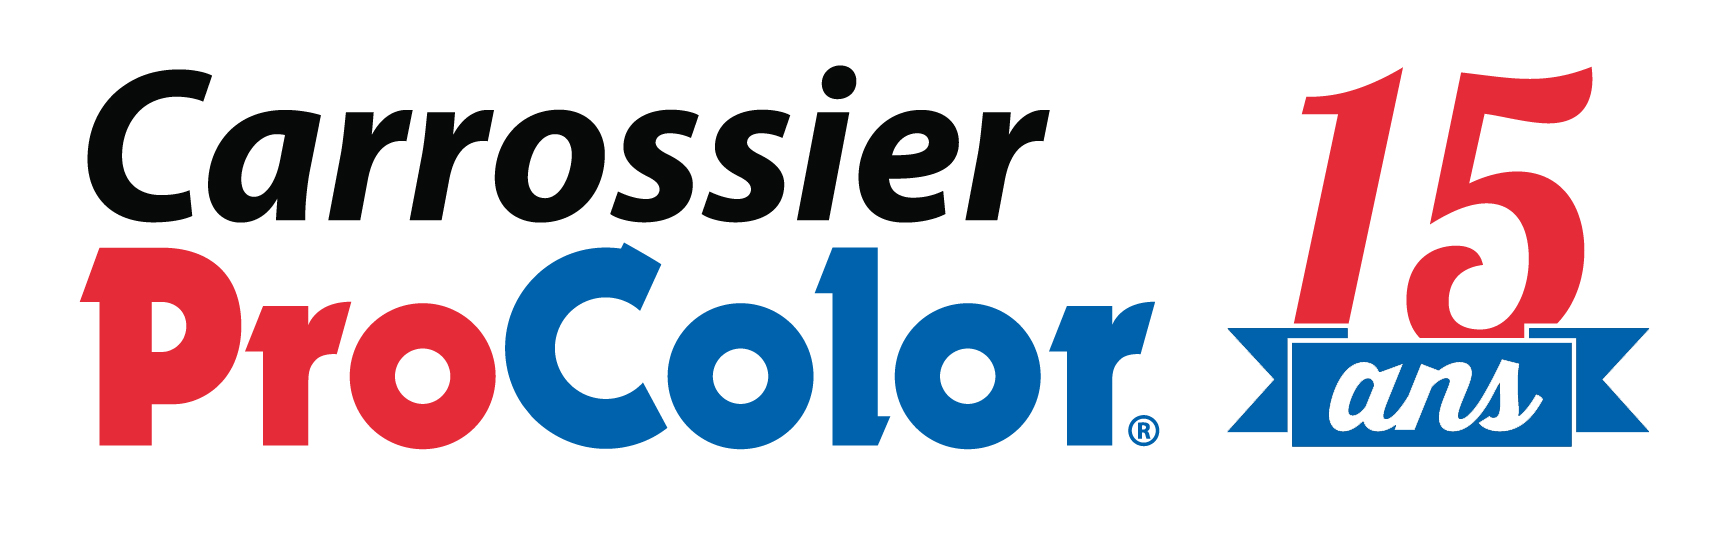 Carrossier Procolor A.M's logo width=